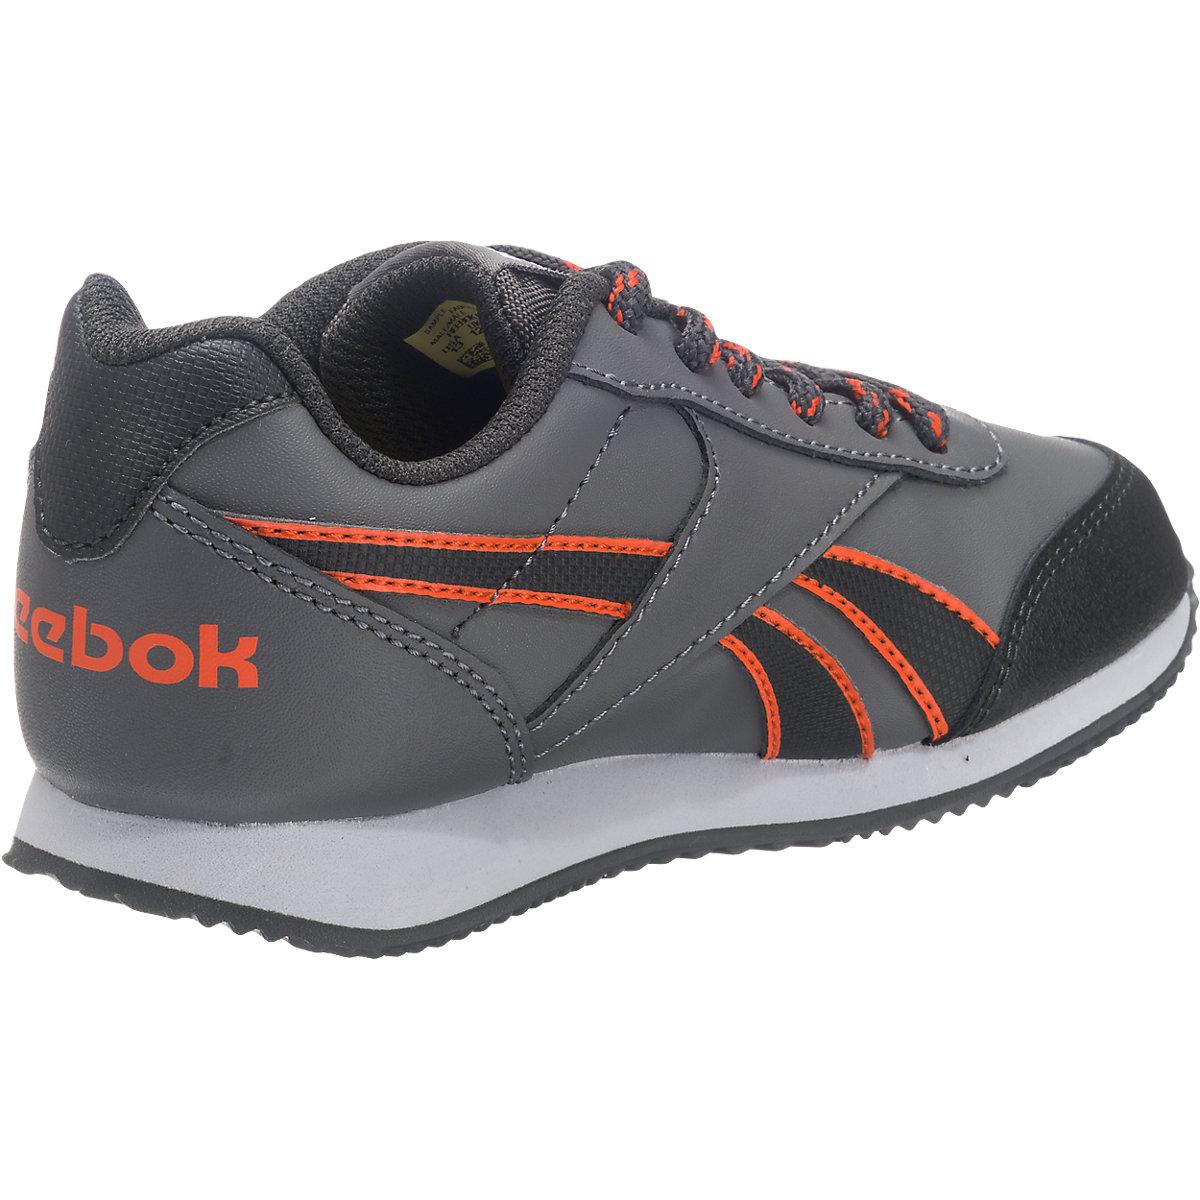 Reebok, Kinder Sneakers ROYAL CLJOG für Jungen, grau ...